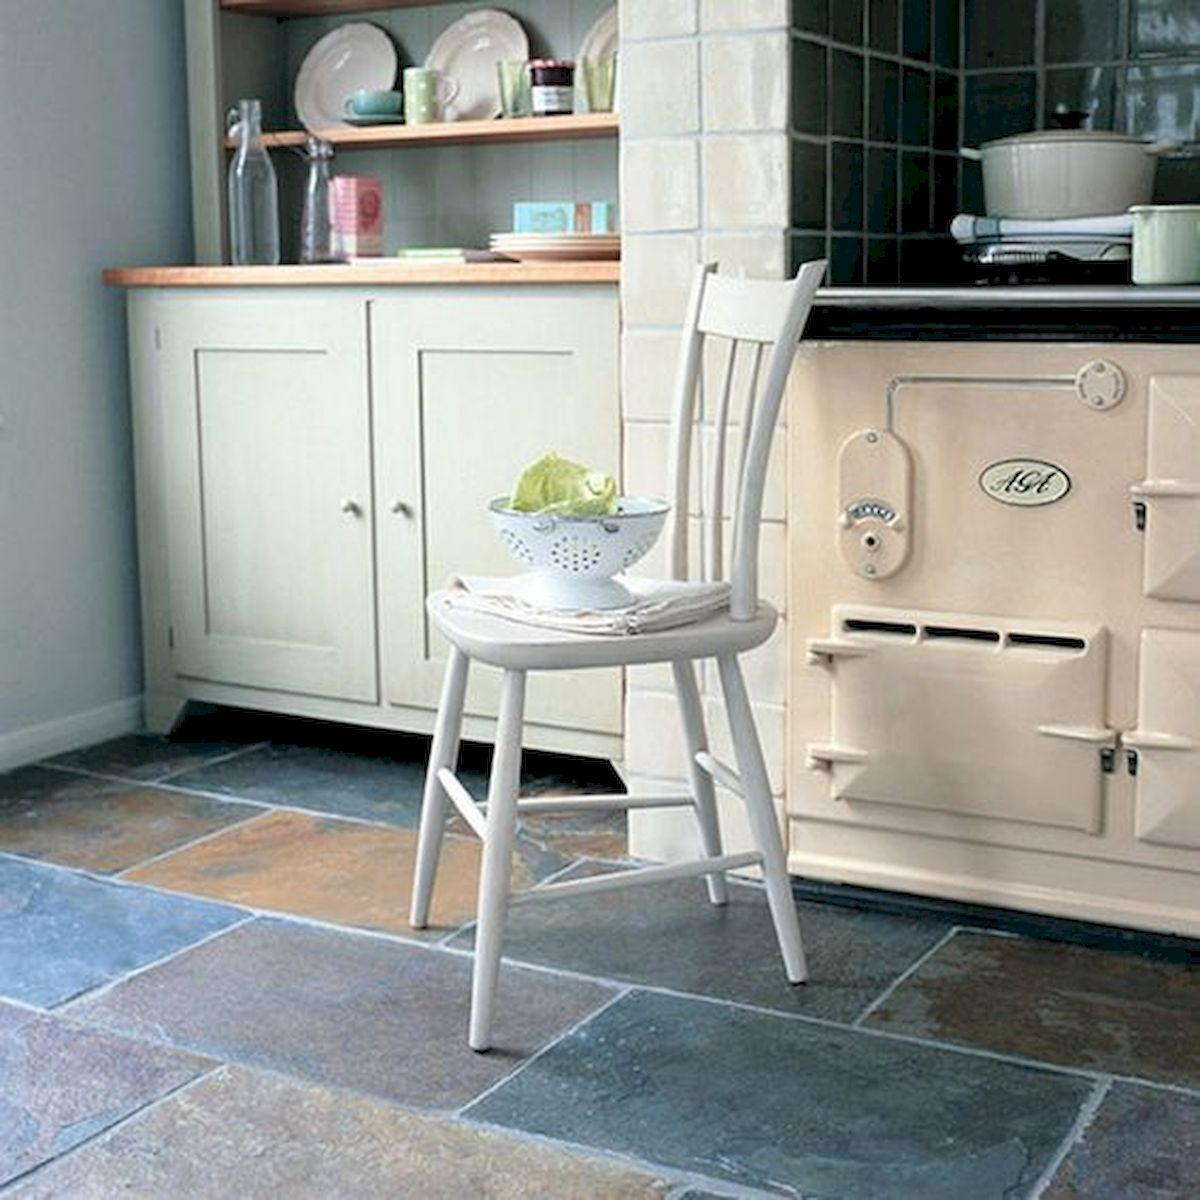 30 Best Kitchen Floor Tile Design Ideas With Concrete Floor Ideas (30)